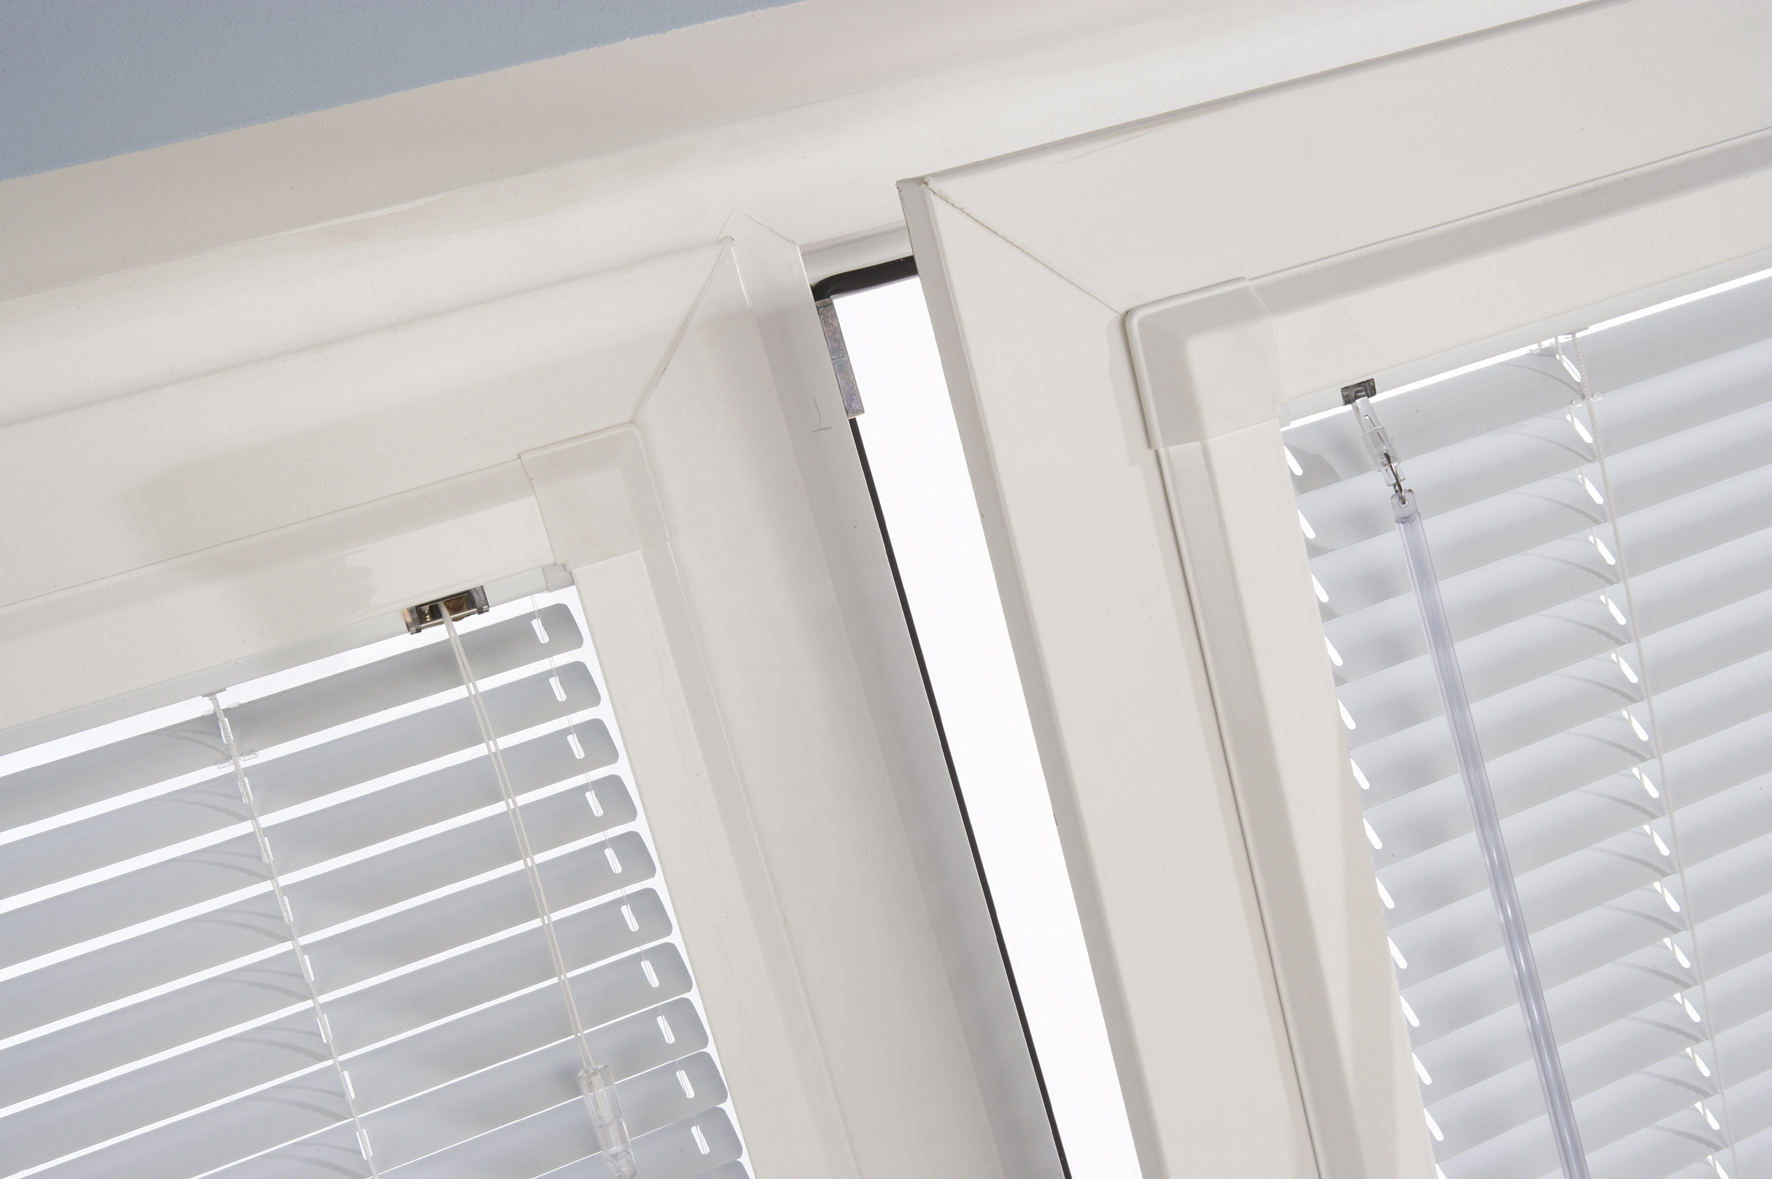 Perfect Fit Blinds : Perfect fit blinds sunrise shutters blindssunrise